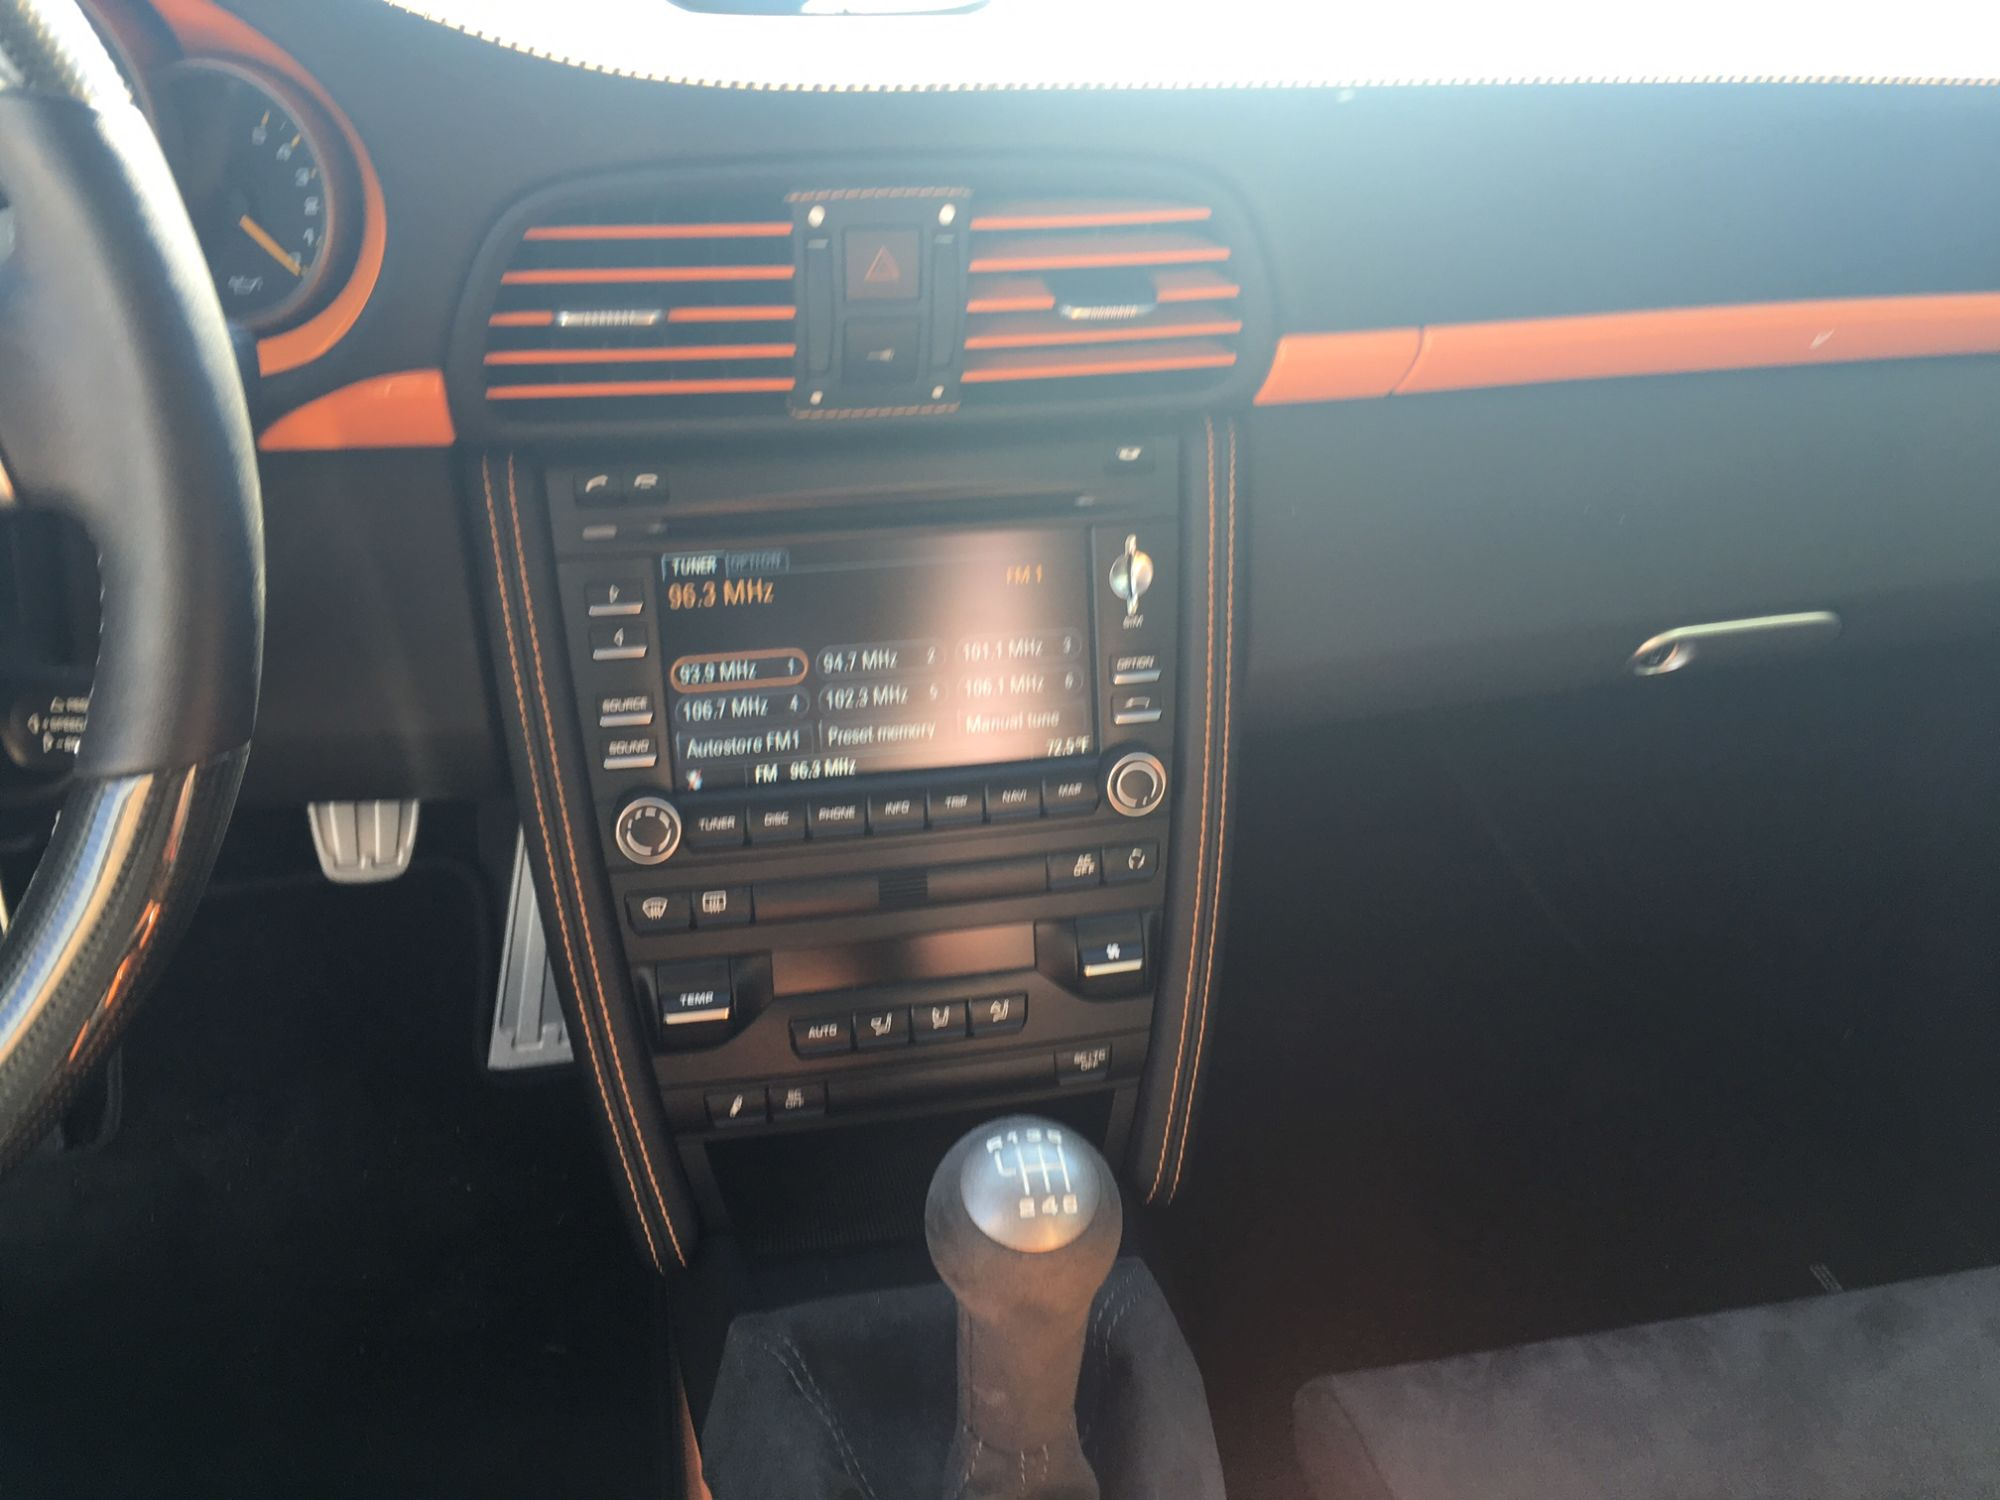 2009-porsche-911-gt2-in-pts-orange-for-sale-at-410000_30 Wonderful Porsche 911 Gt2 Wheel for Sale Cars Trend